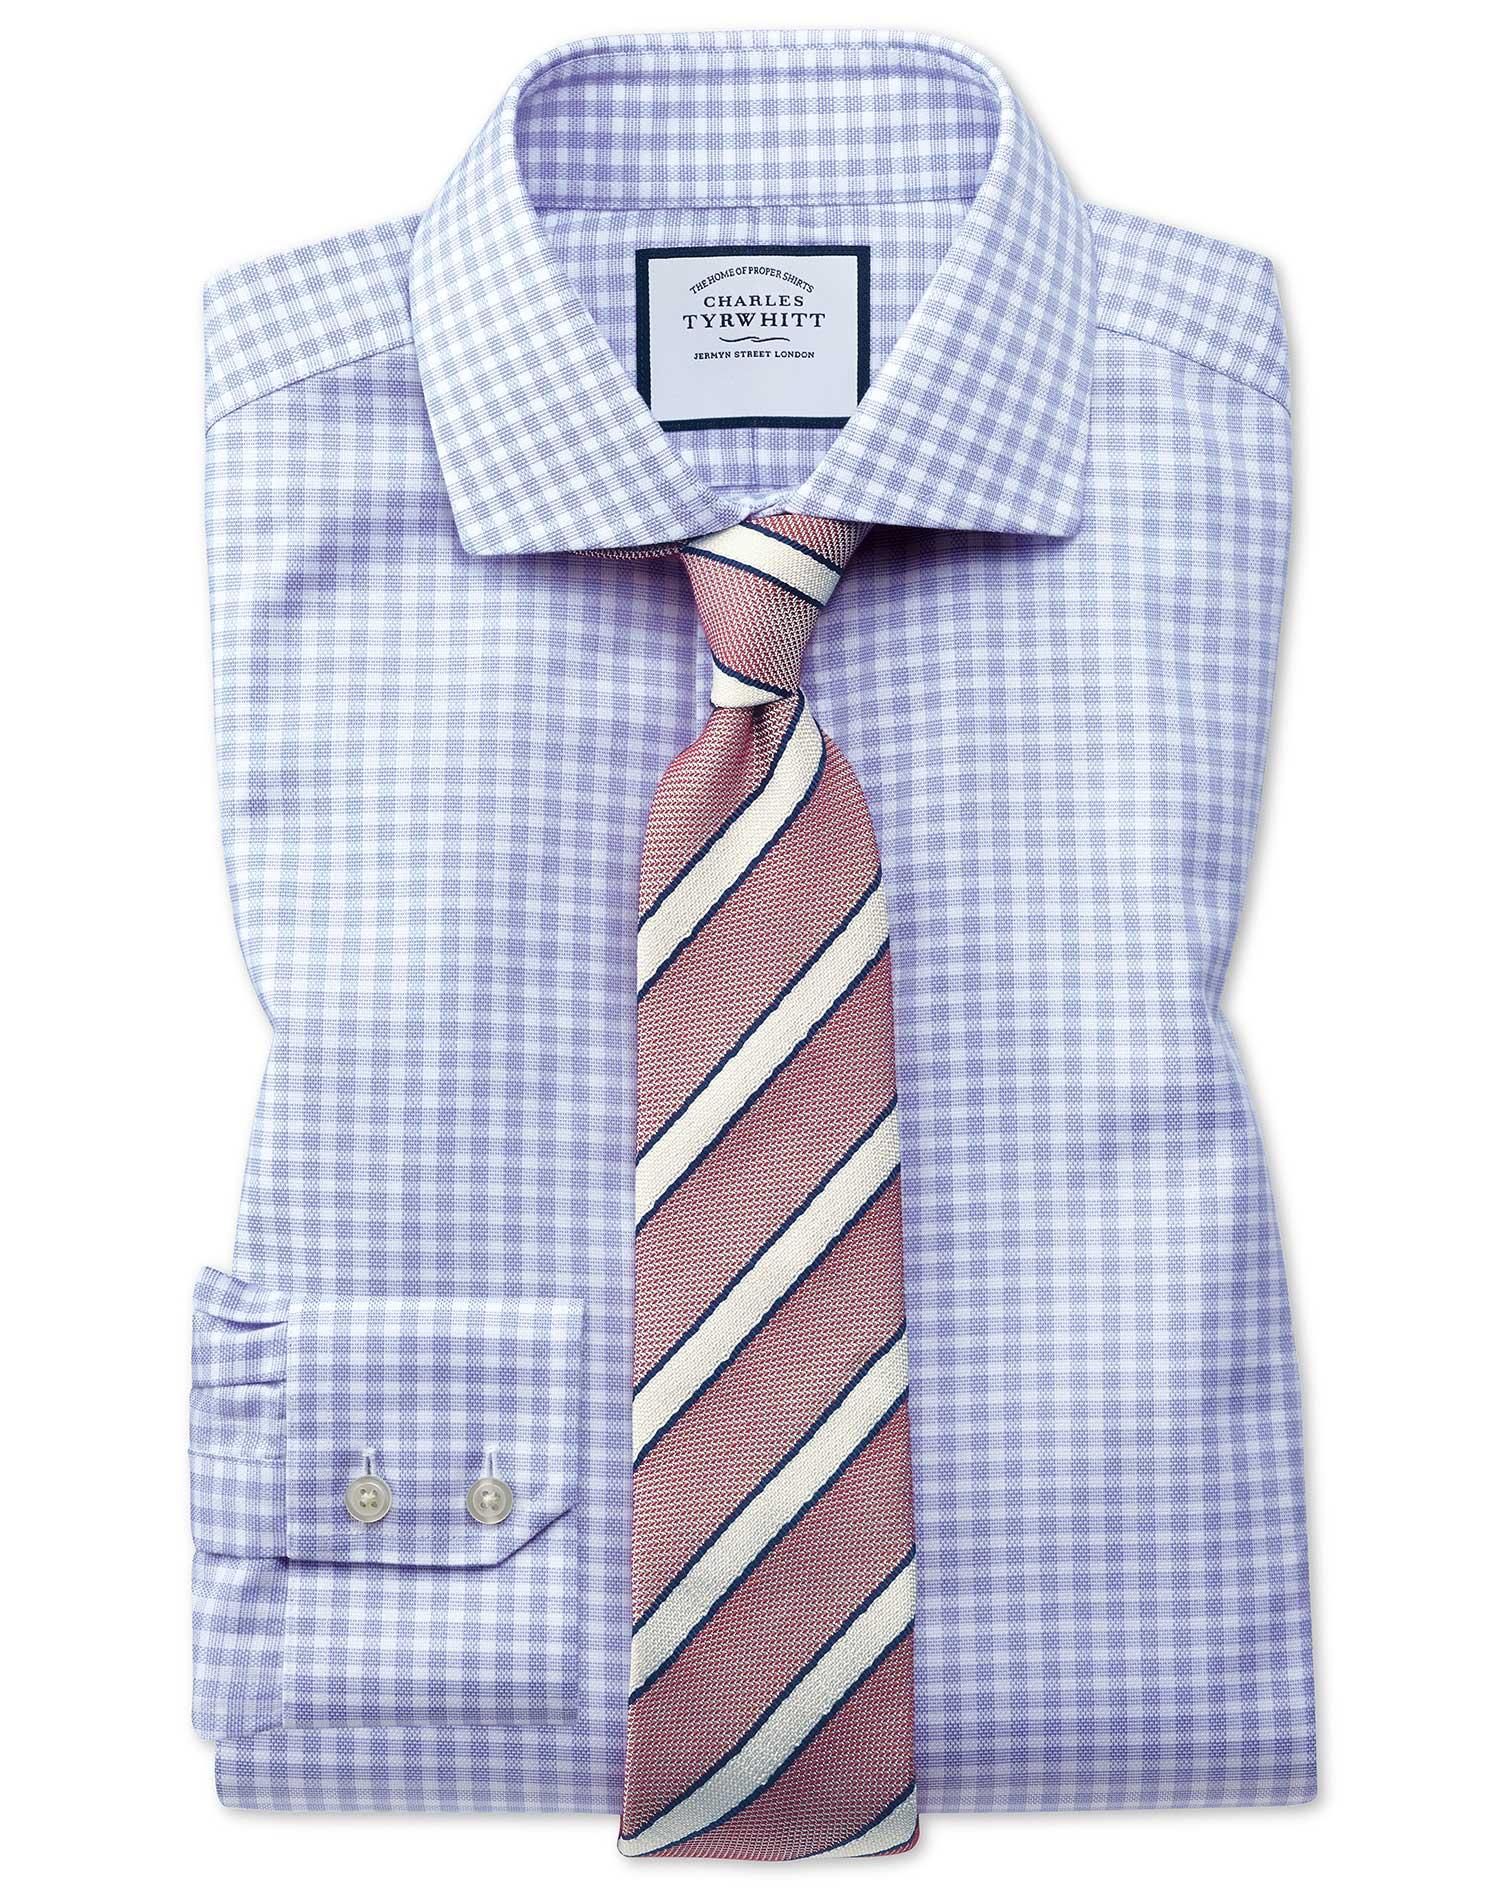 Extra Slim Fit Cutaway Collar Non-Iron Cotton Stretch Oxford Blue Check Formal Shirt Single Cuff Siz